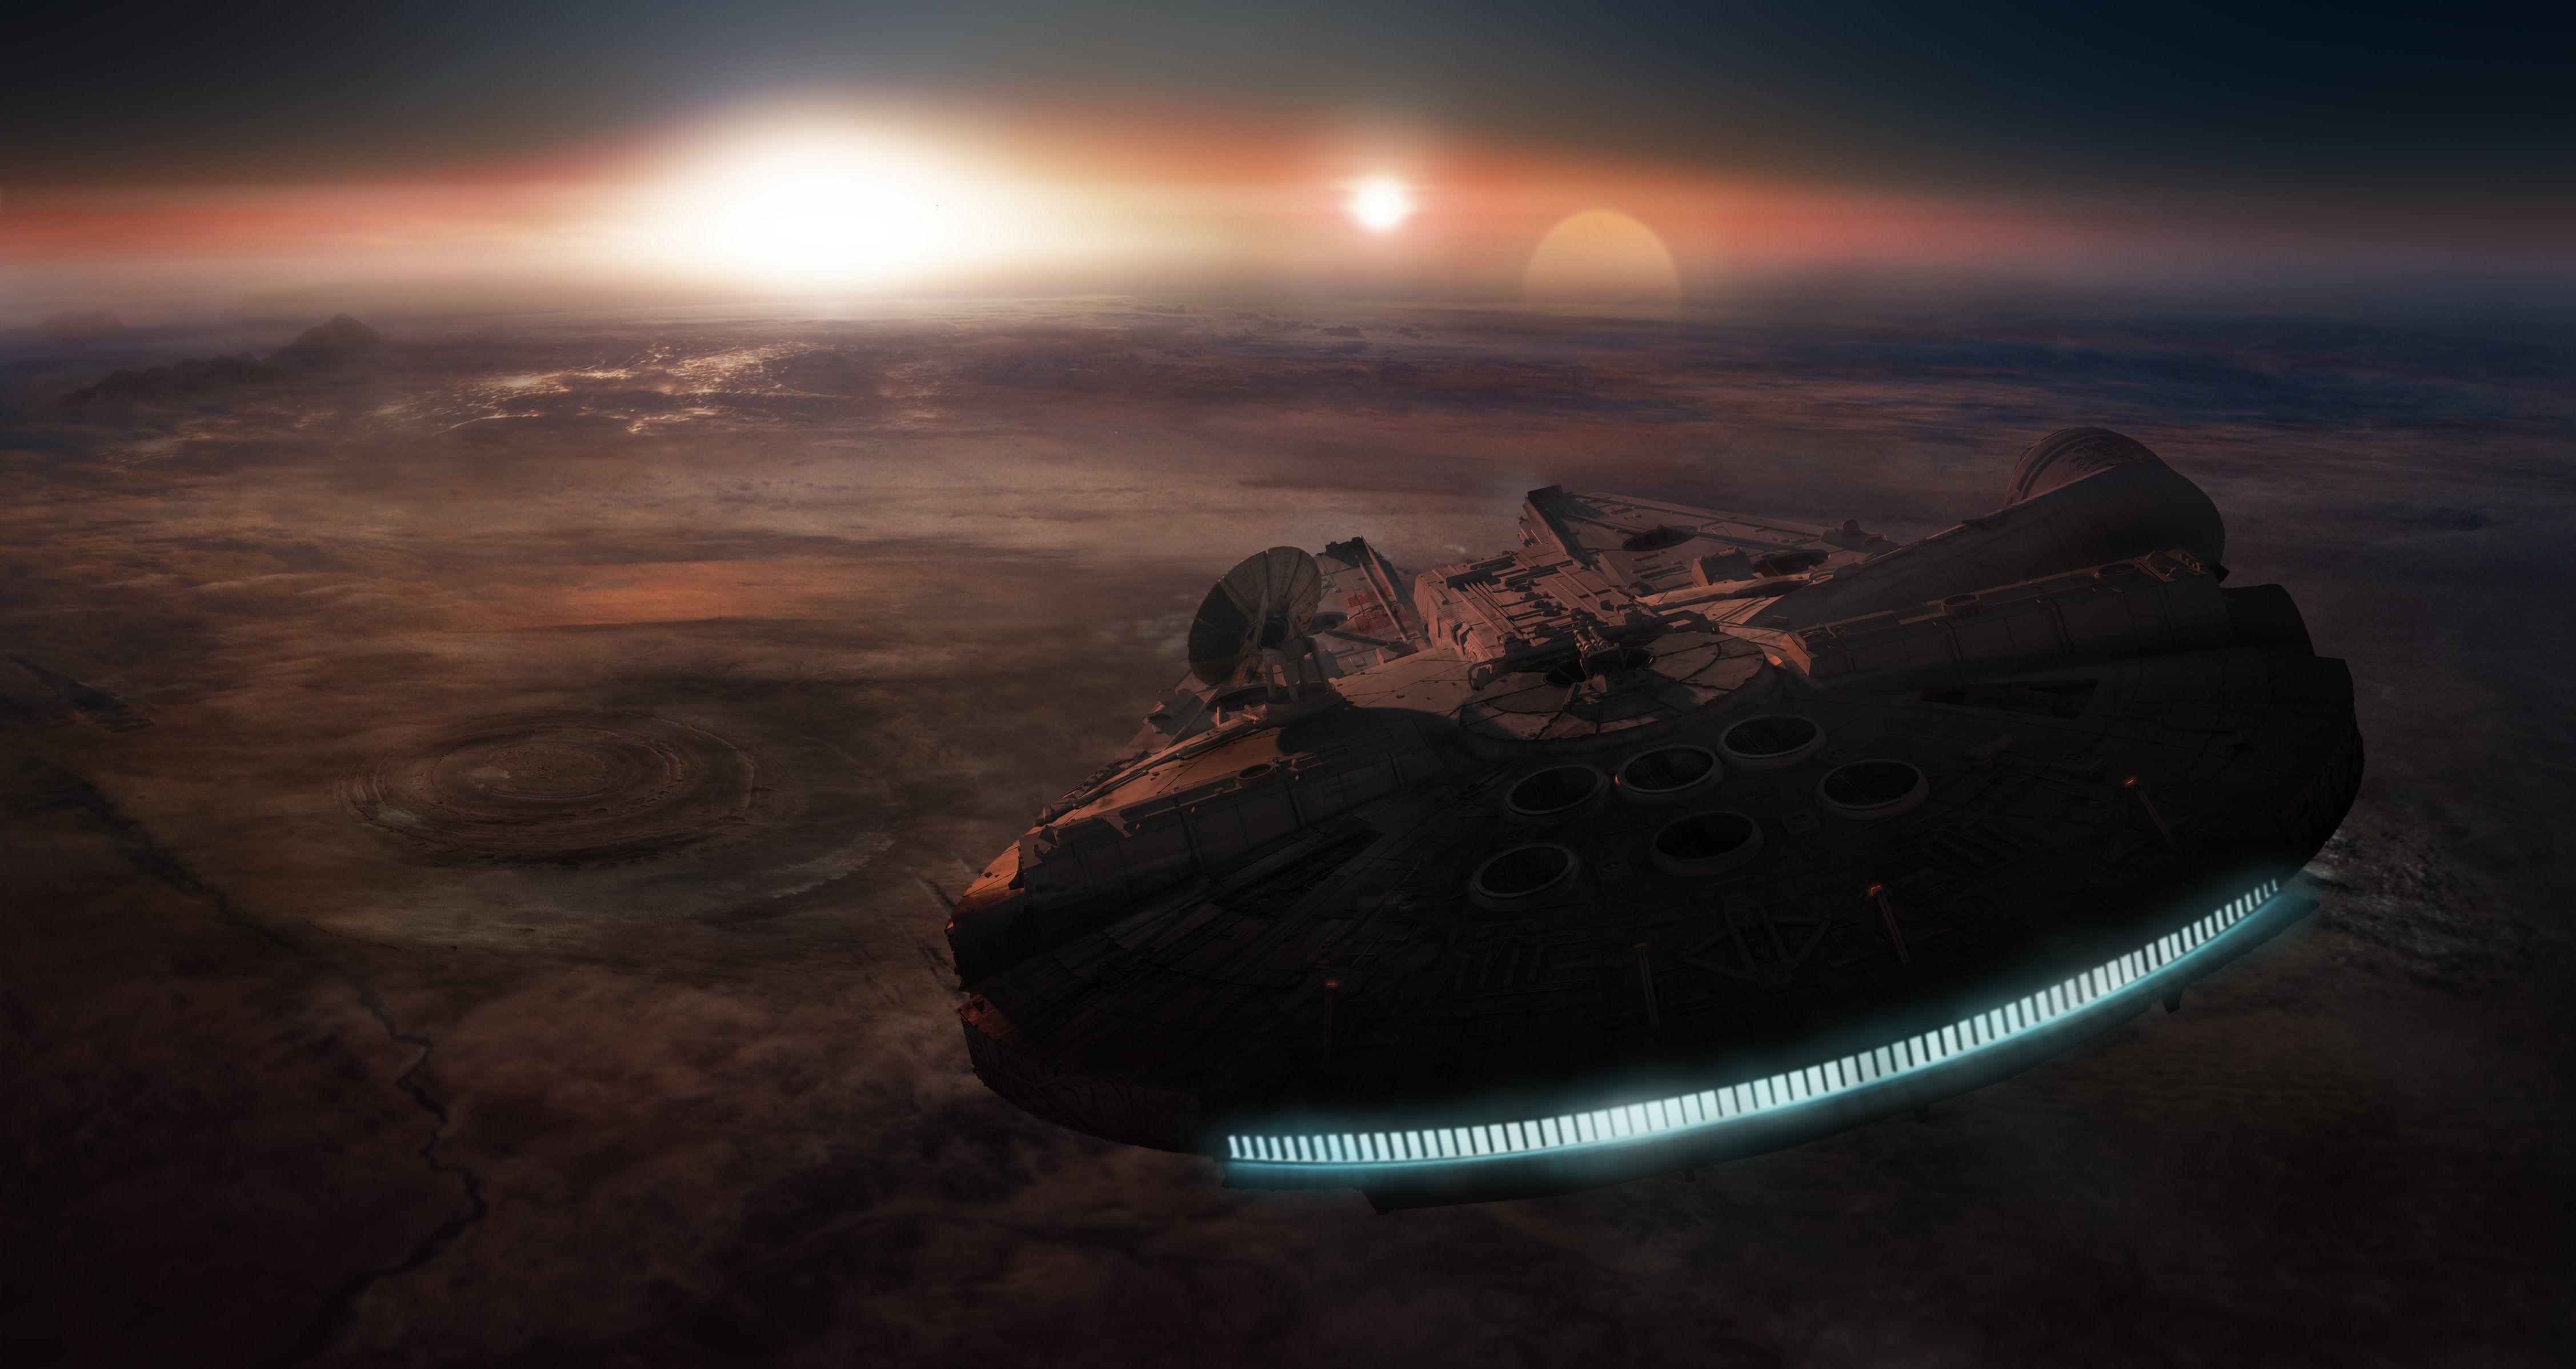 STAR WARS FORCE AWAKENS scifi action adventure disney